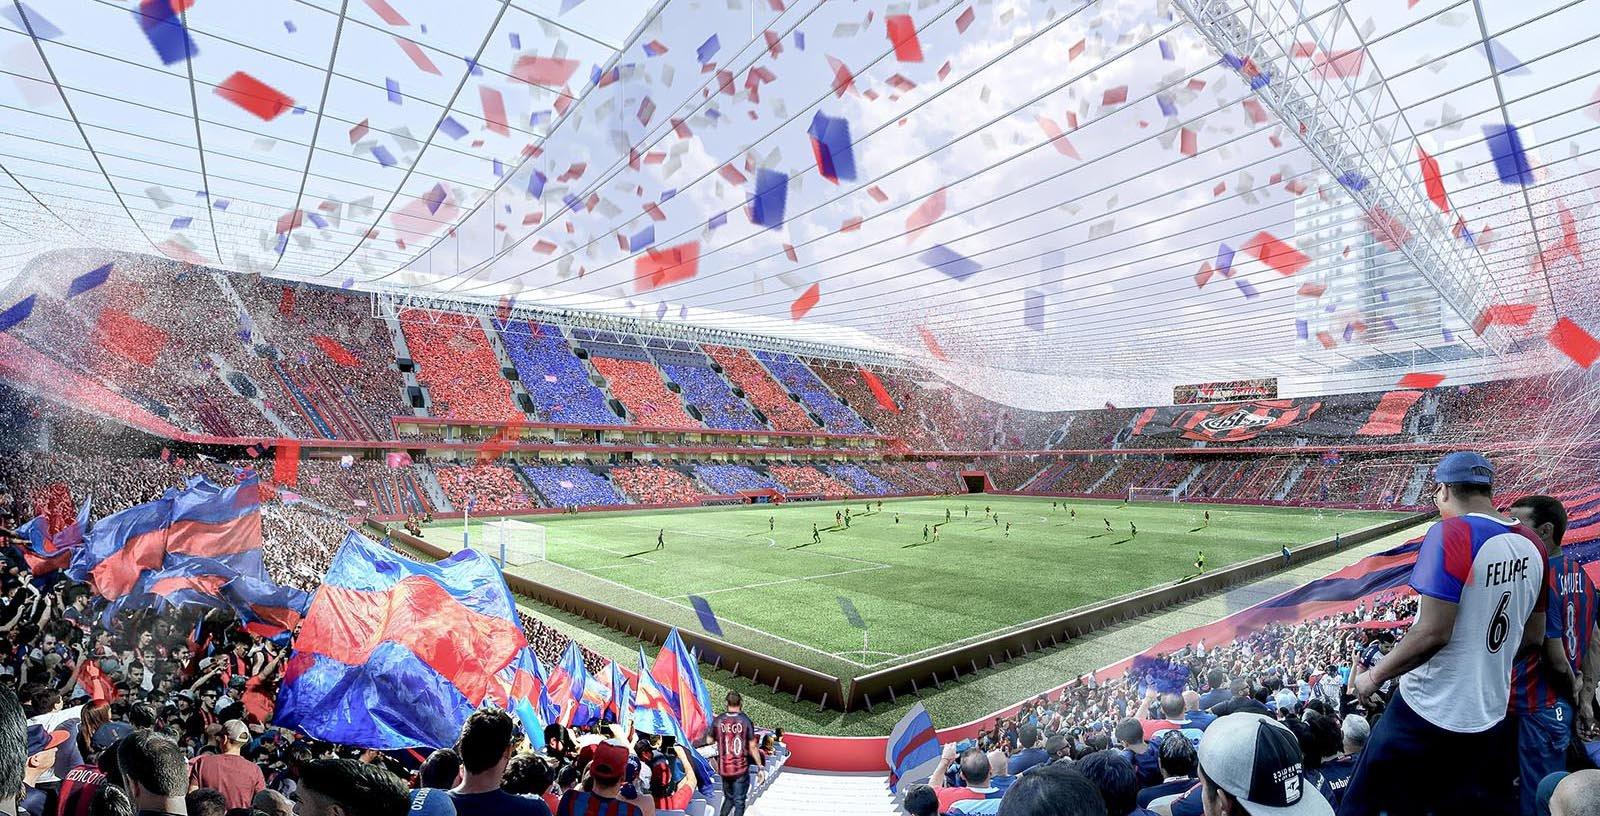 Estadio_San_Lorenzo_Bowl_Diurno_Publico_1